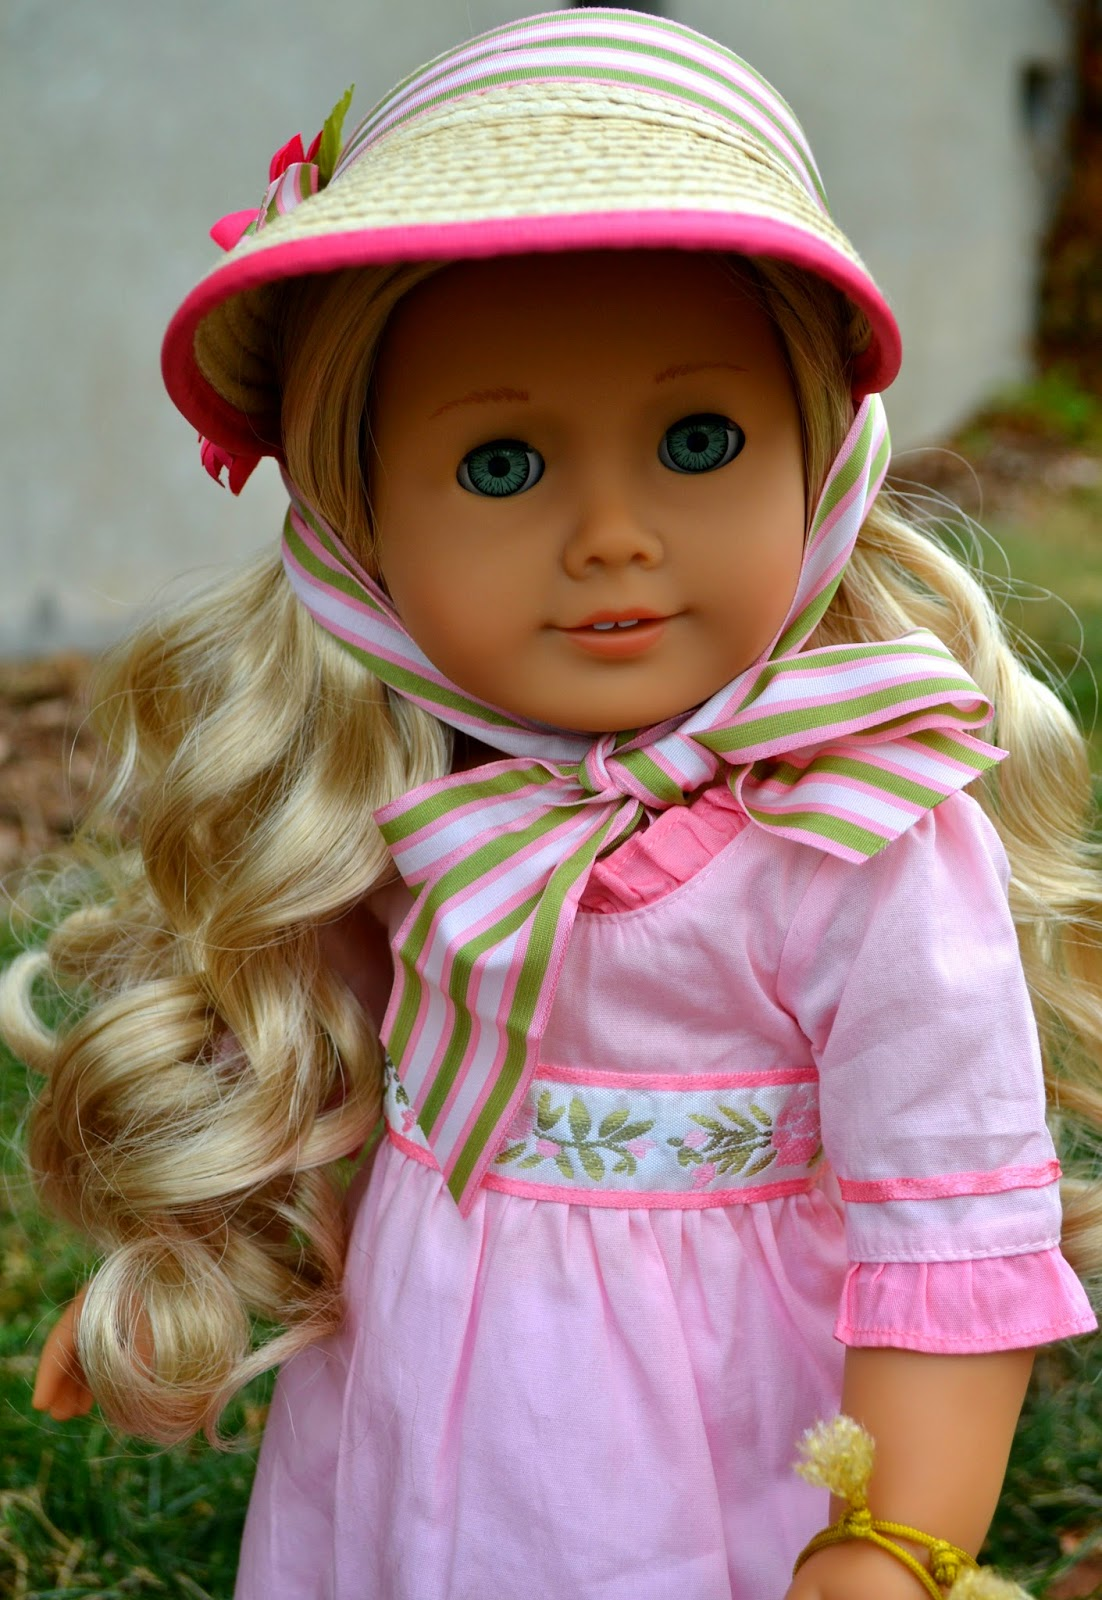 Caroline S 37 Piece Capsule Wardrobe Creative Process: The Doll Grotto: American Girl: Caroline Abbott Doll And